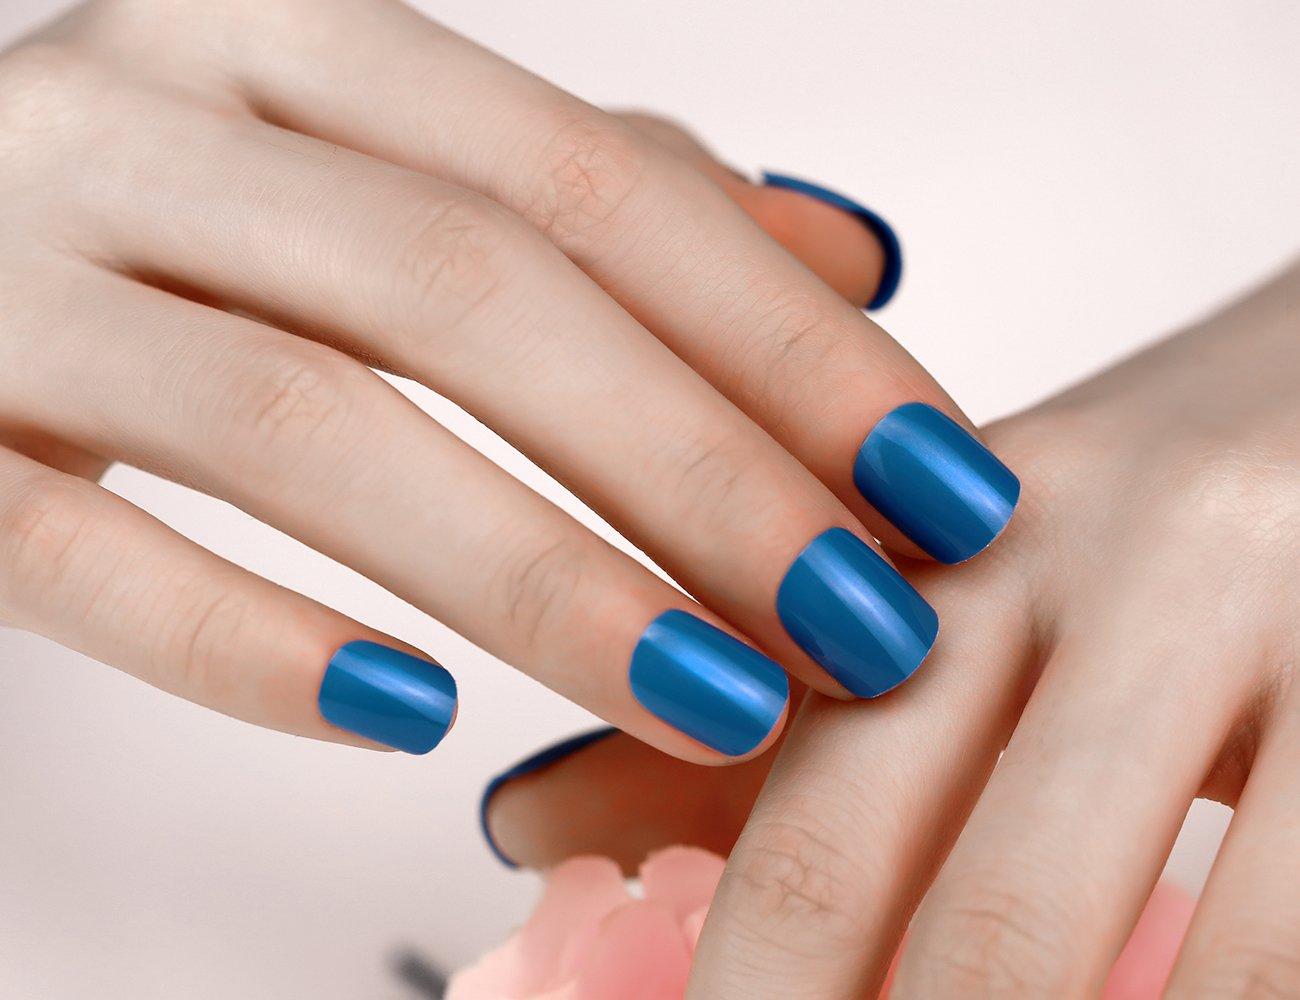 Amazon.com : ArtPlus 24pcs x 3 (3-Pack) Color Small Fake Nails Gel ...